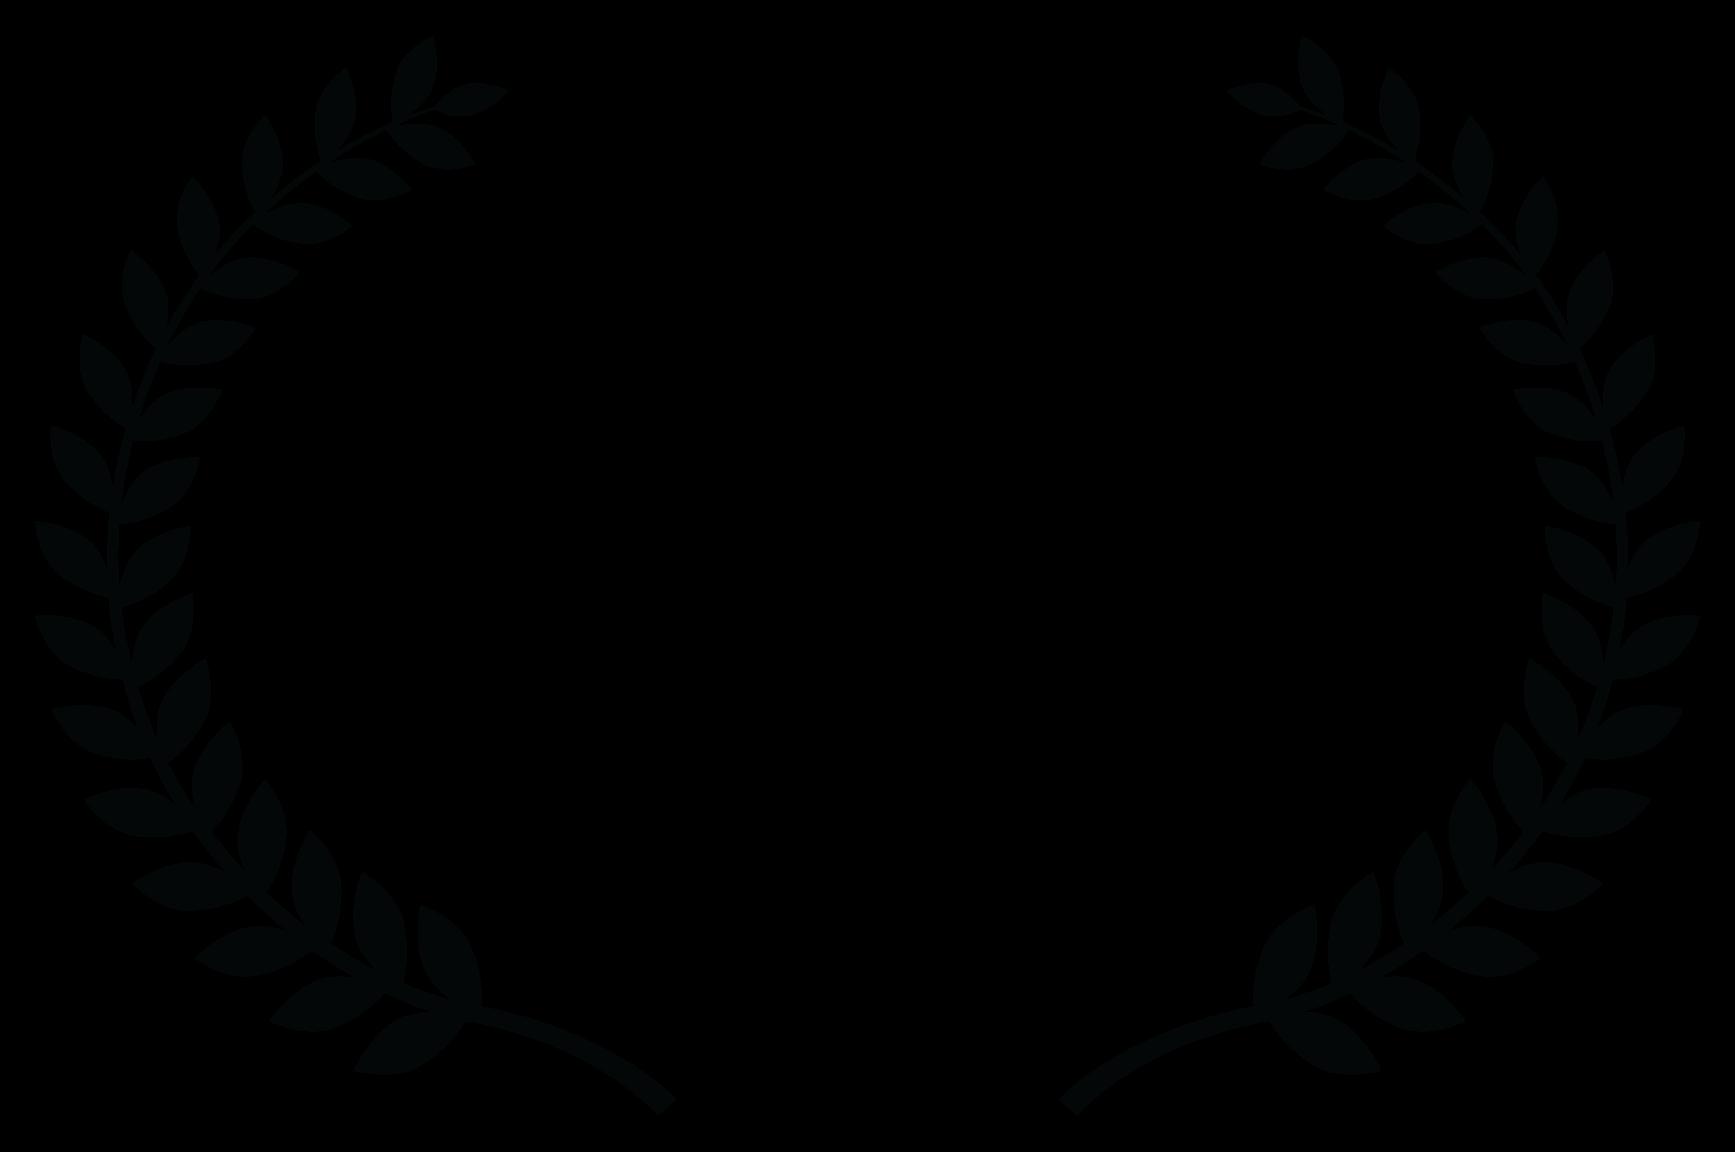 OFFICIAL SELECTION - Aphrodite Film Awards - 2021